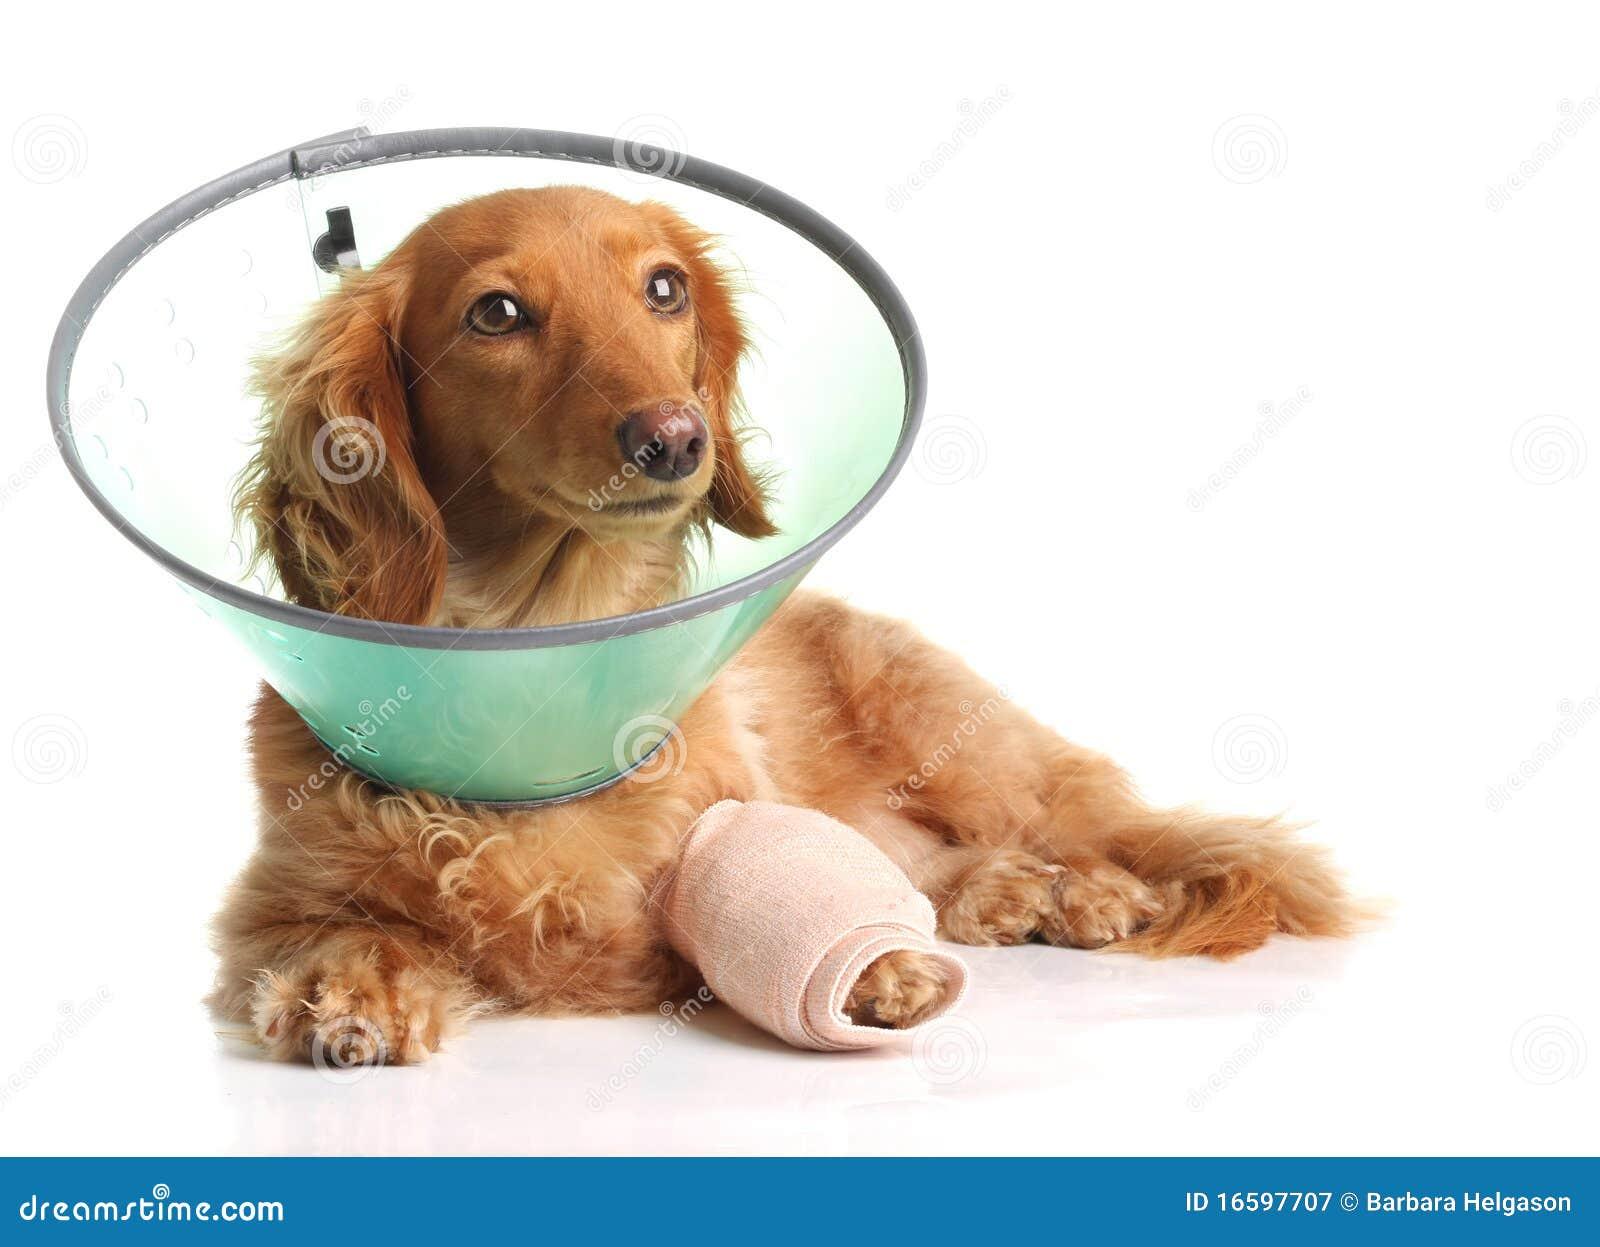 Sick Dog Royalty Free Stock Photography - Image: 16597707